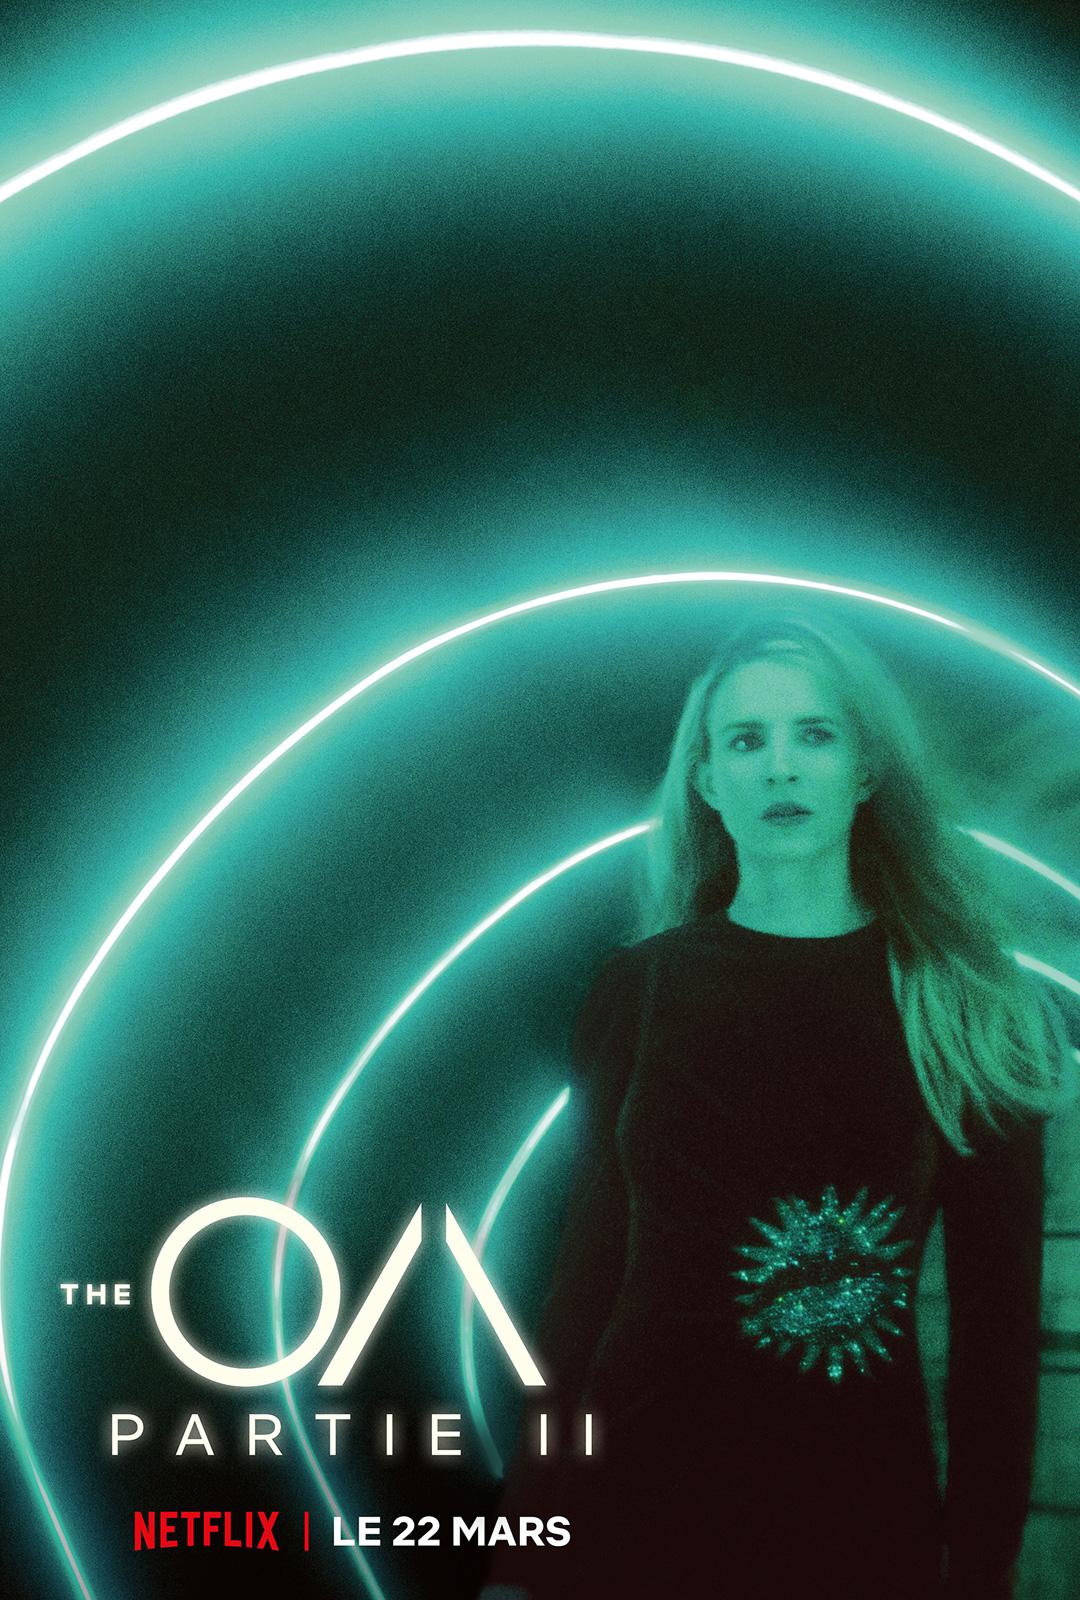 The Oa Staffel 3